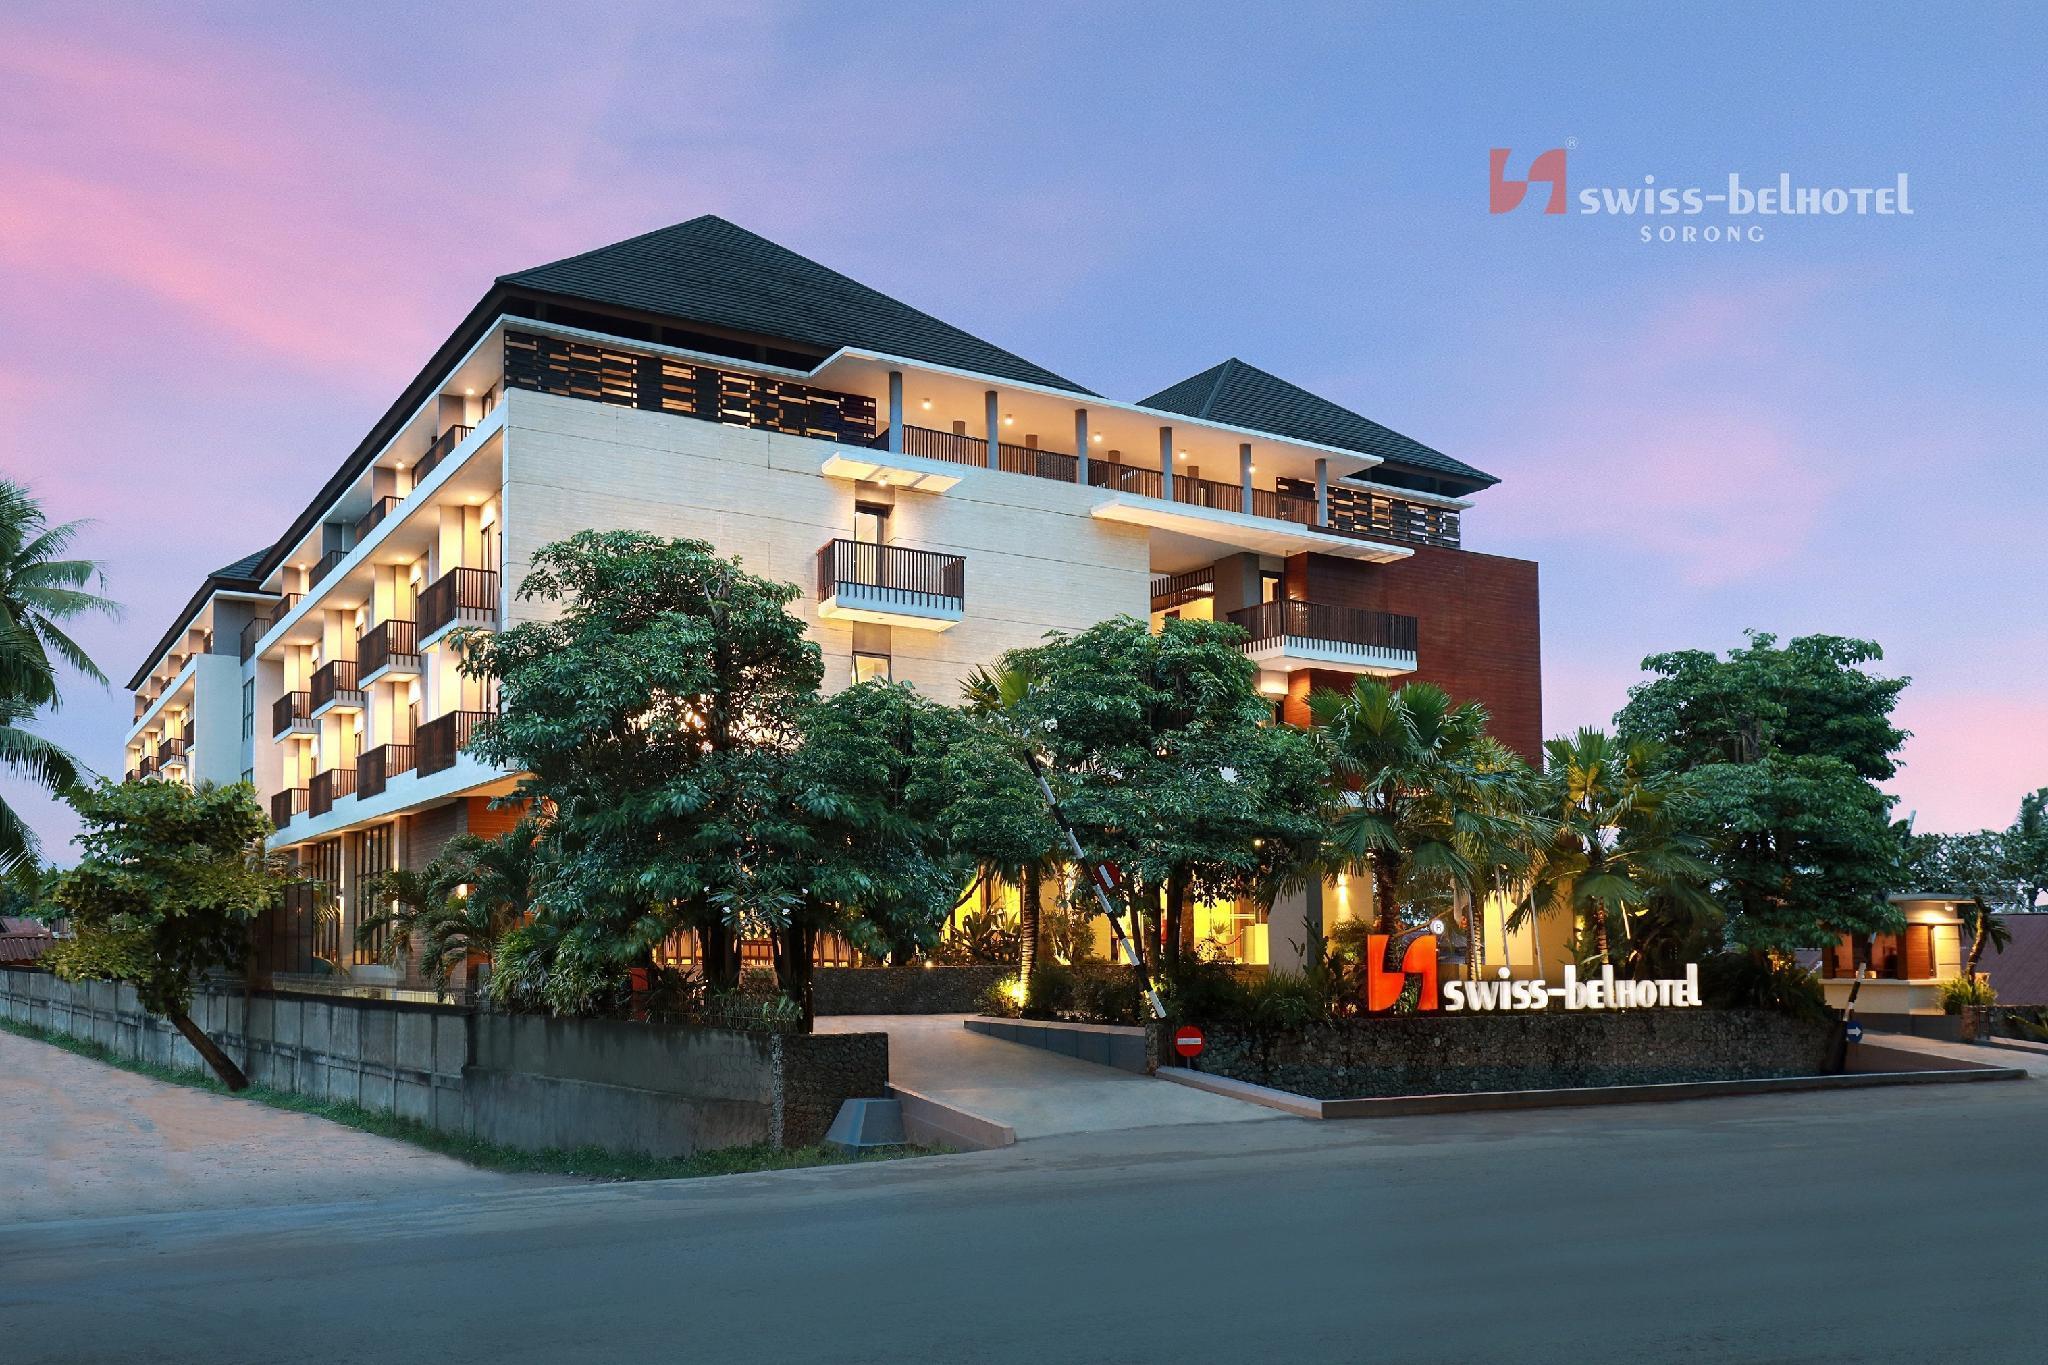 Swiss Belhotel Sorong